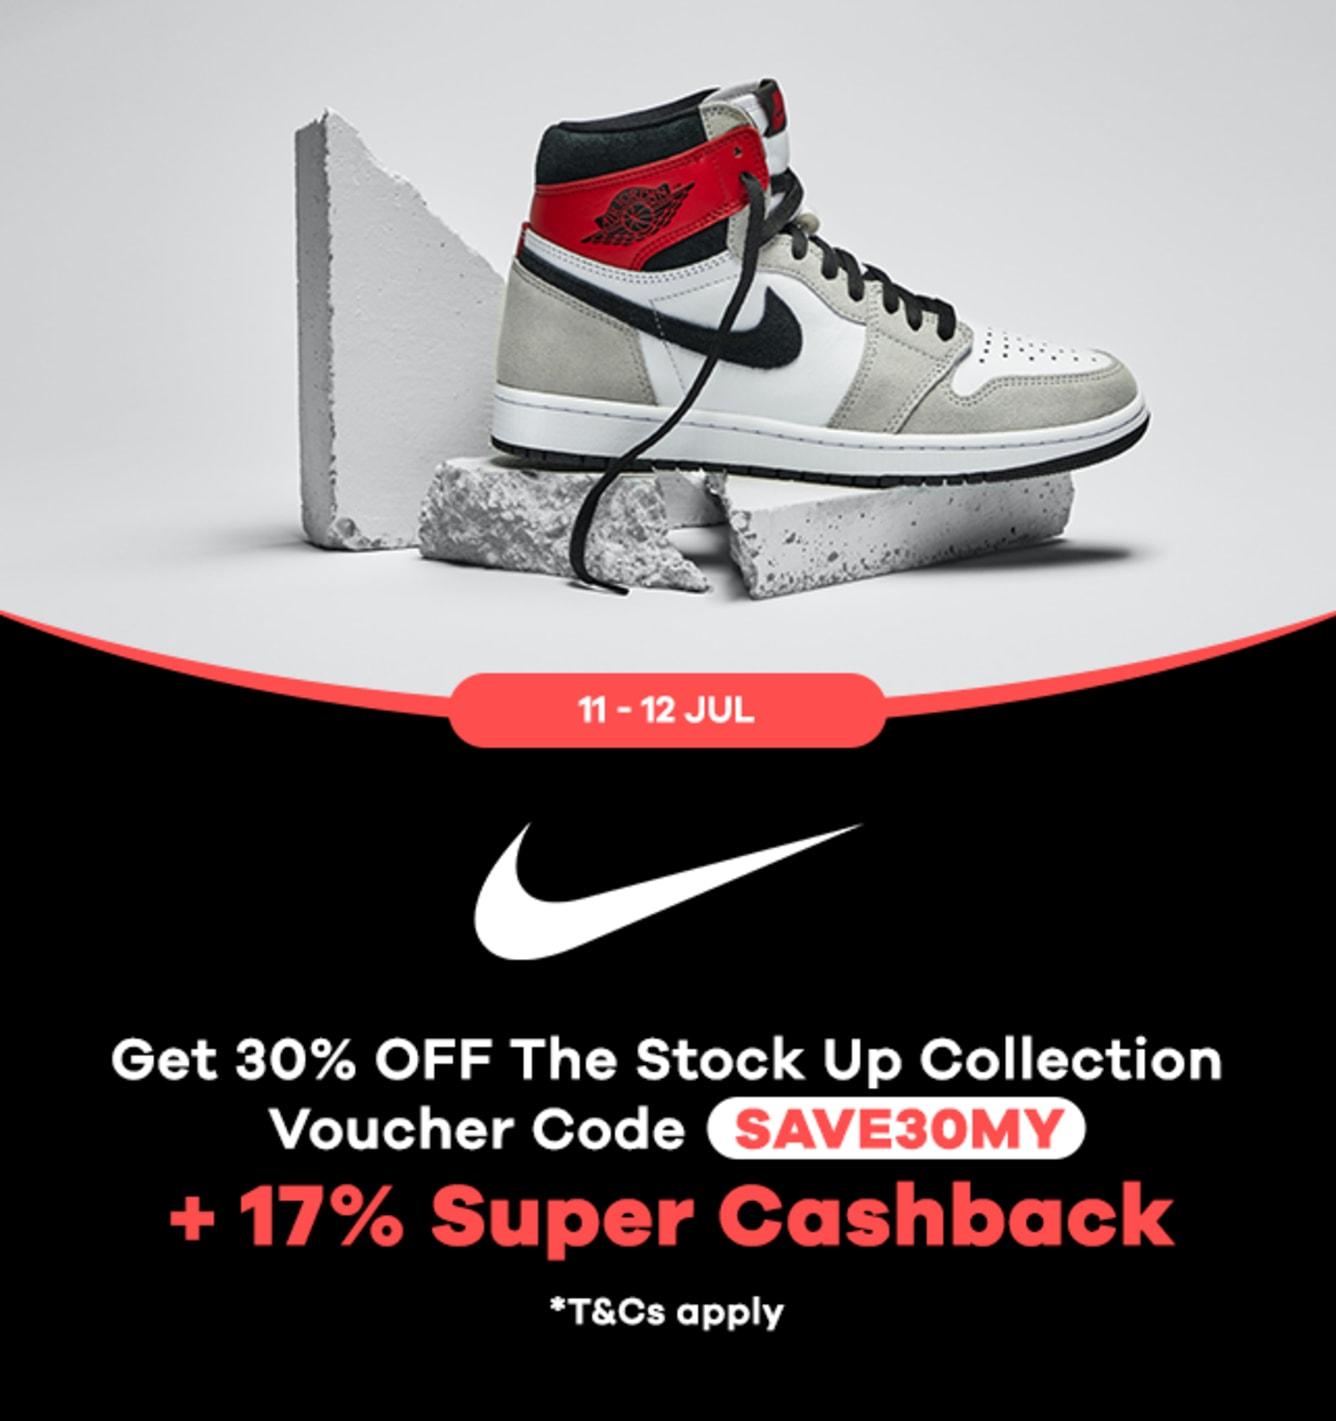 Nike Flash Sale: 7.5% Cashback